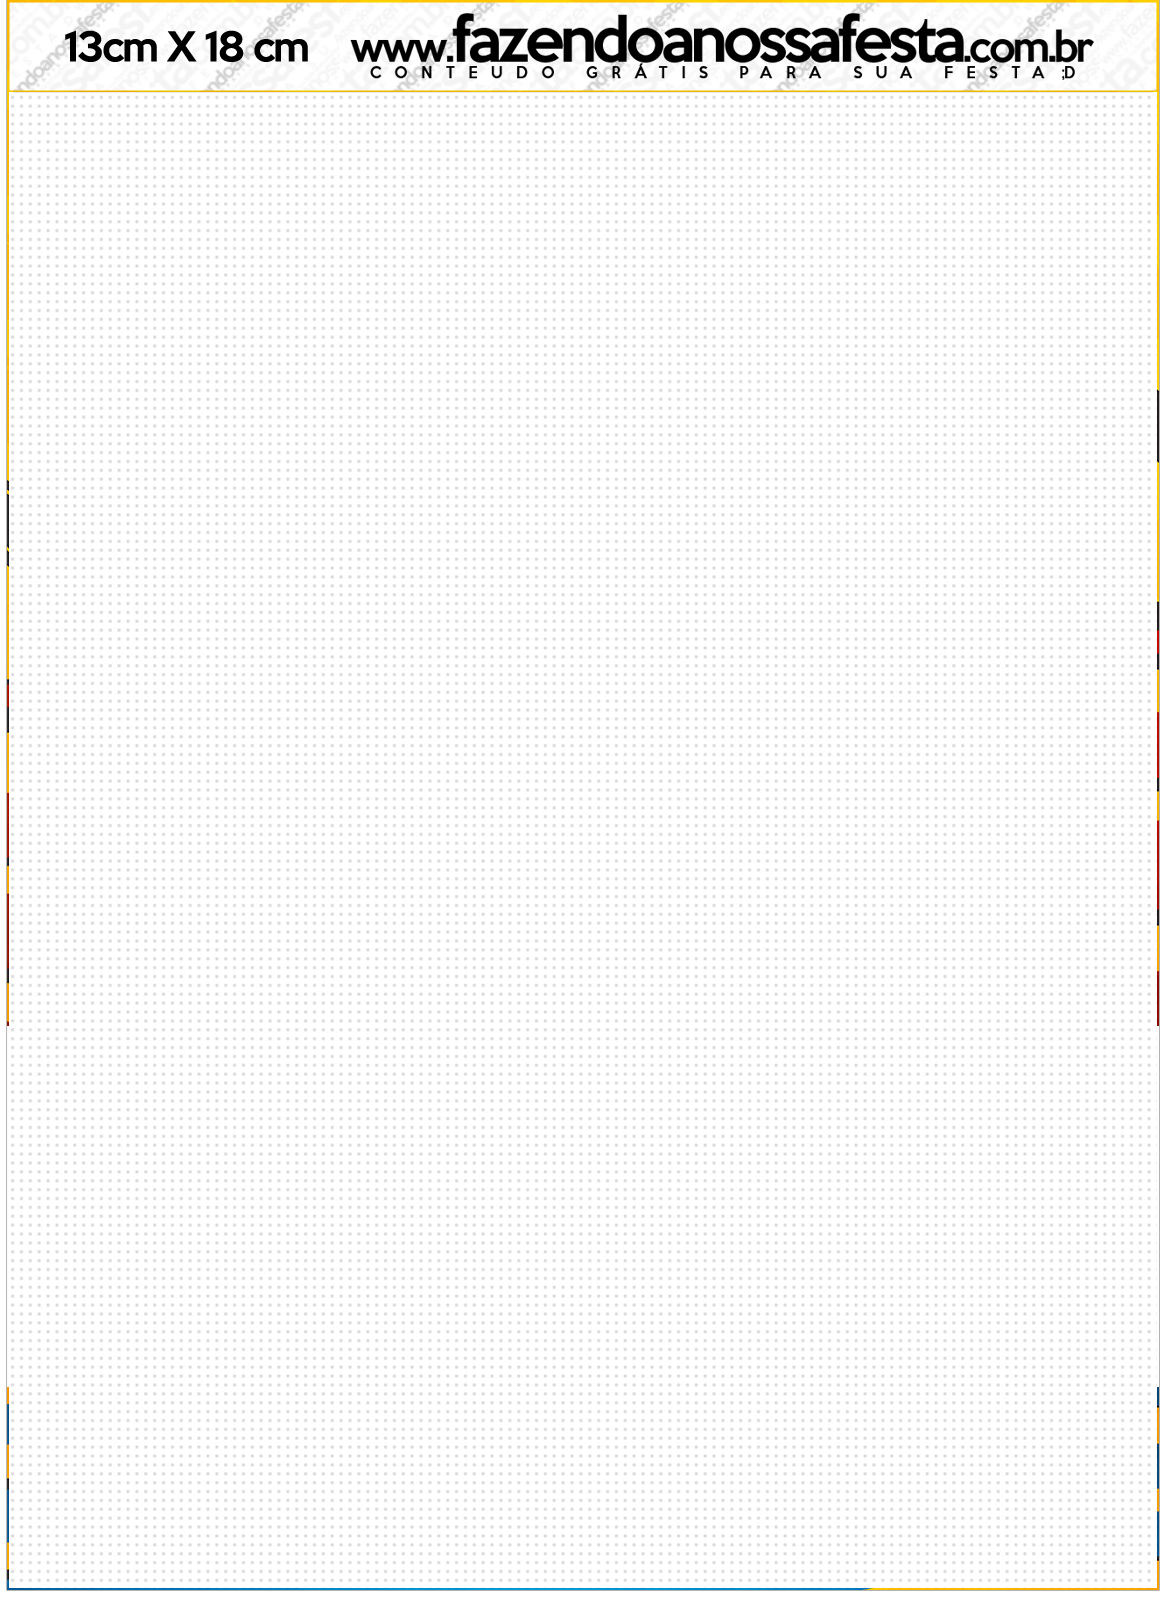 Convite para Envelope Kit Festa Snoopy e sua Turma